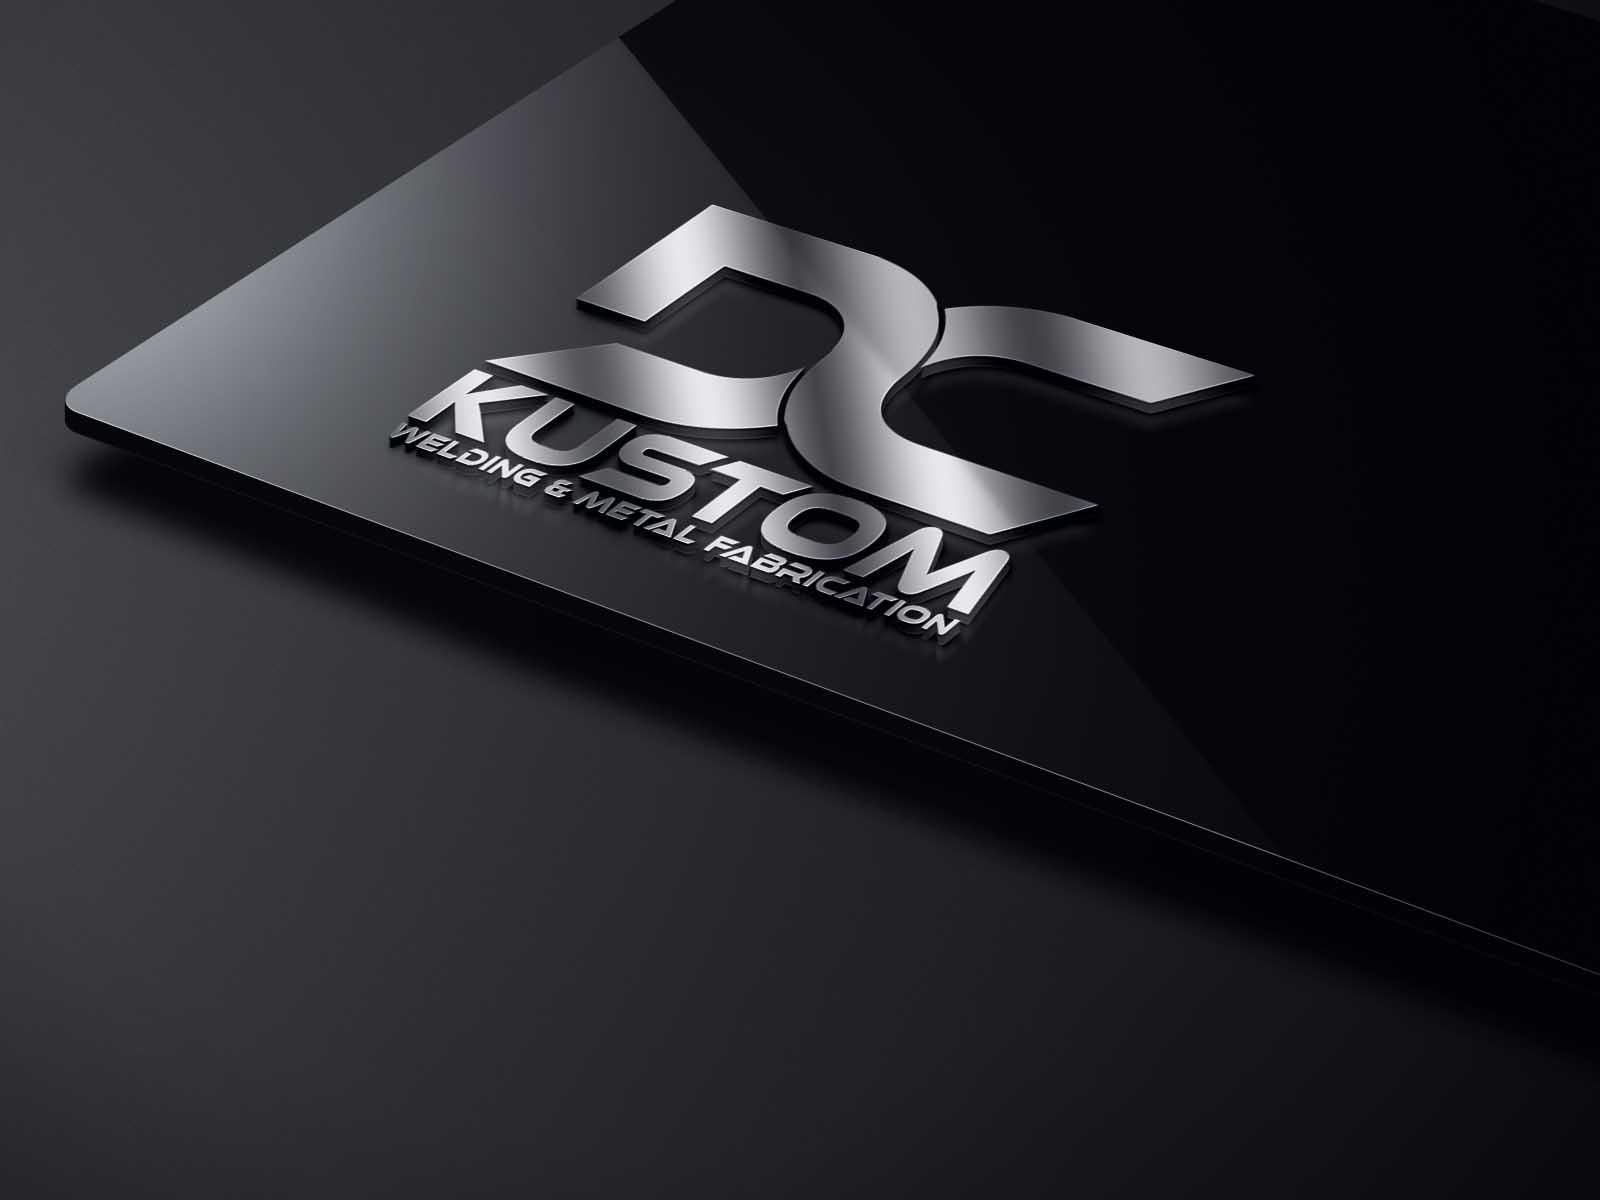 Logo Design by brands_in - Entry No. 110 in the Logo Design Contest Imaginative Logo Design for DC KUSTOM WELDING & METAL FABRICATION.